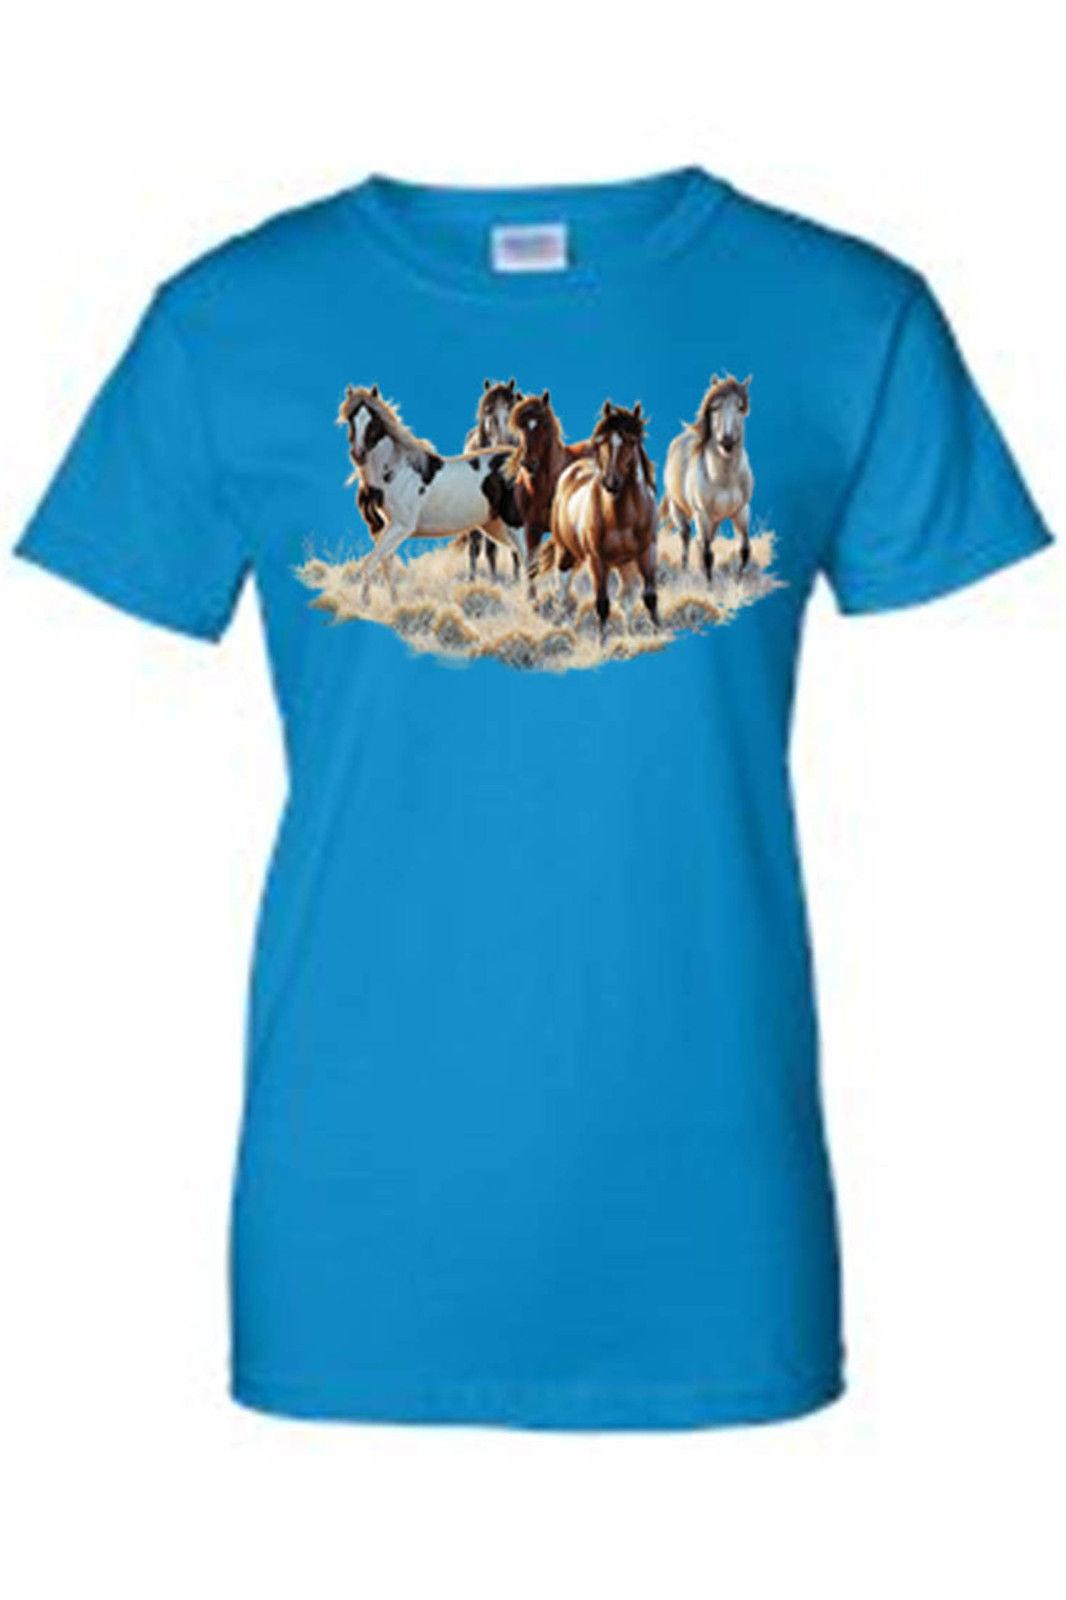 juniors t shirt pack of wild horses mustang freedom running animal american ebay. Black Bedroom Furniture Sets. Home Design Ideas